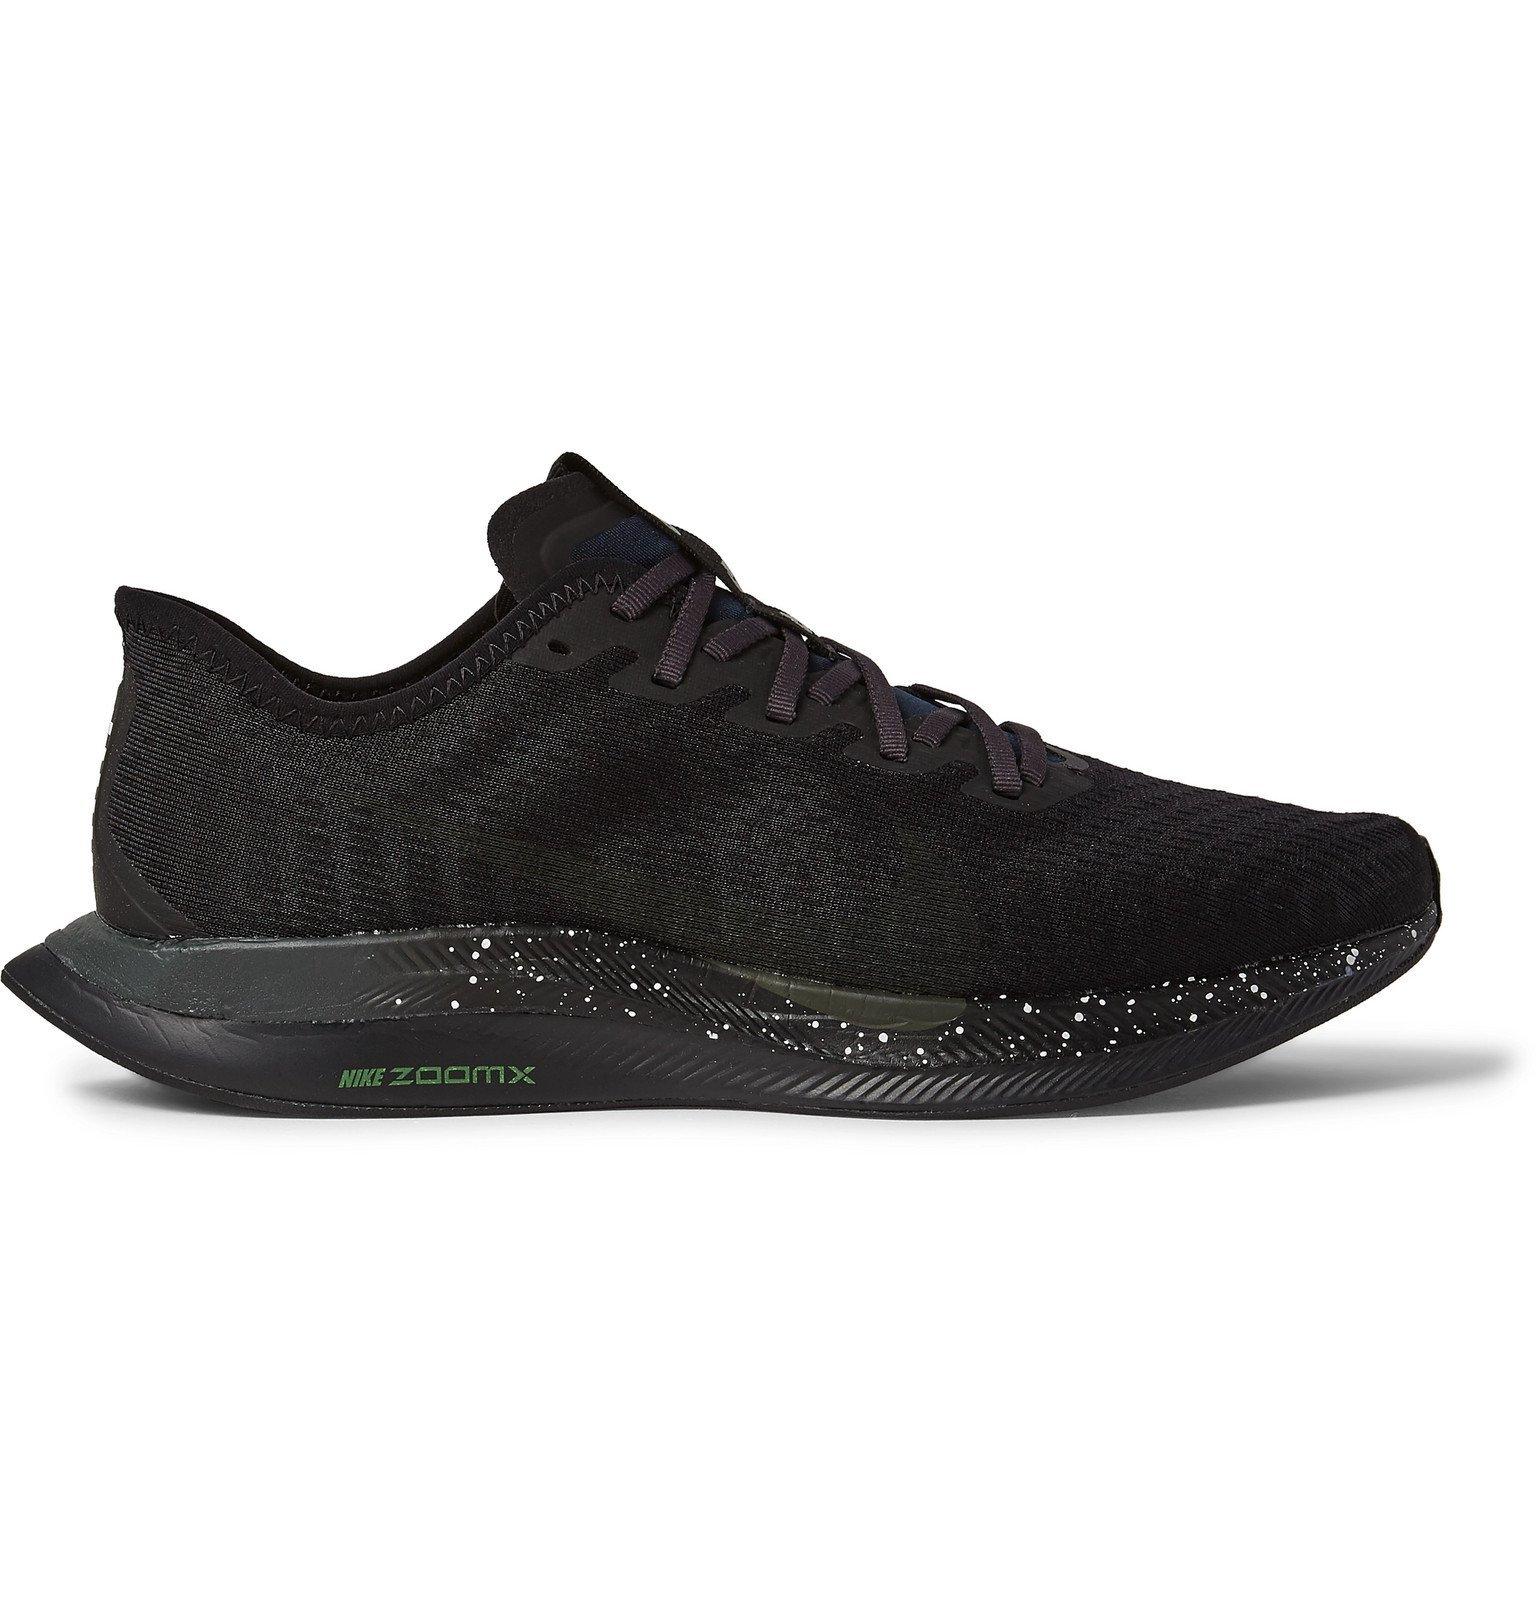 Nike Running - Zoom Pegasus Turbo 2 Mesh Running Sneakers - Black